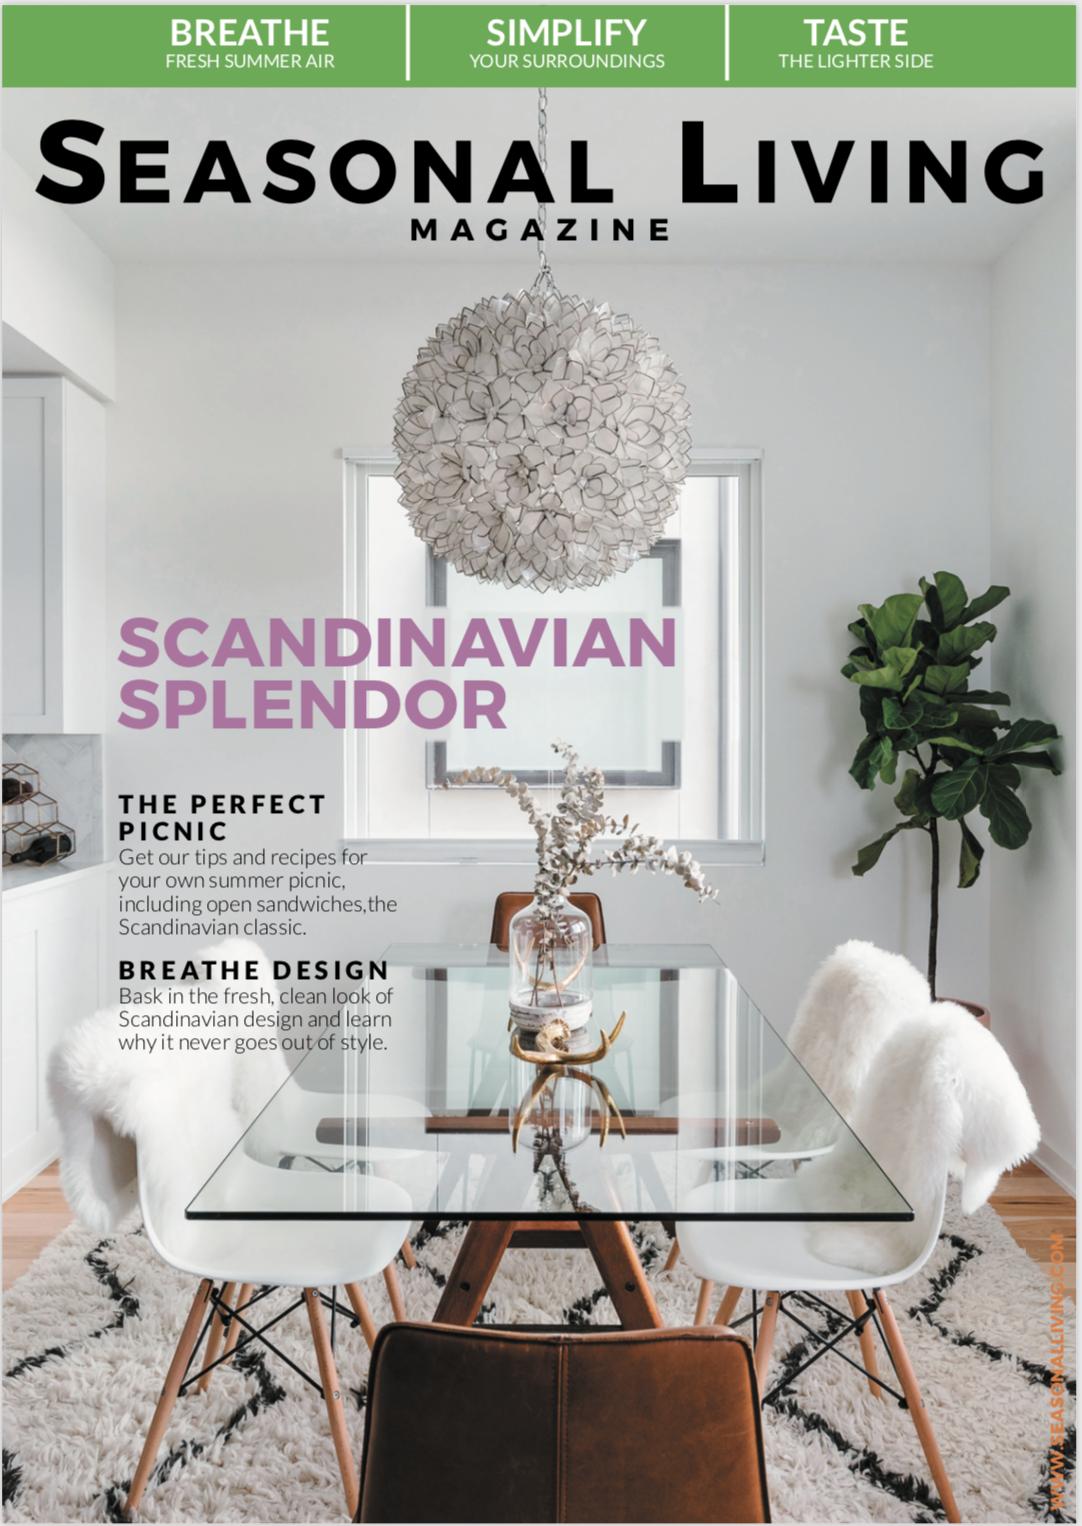 Seasonal Living Magazine Scandinavia